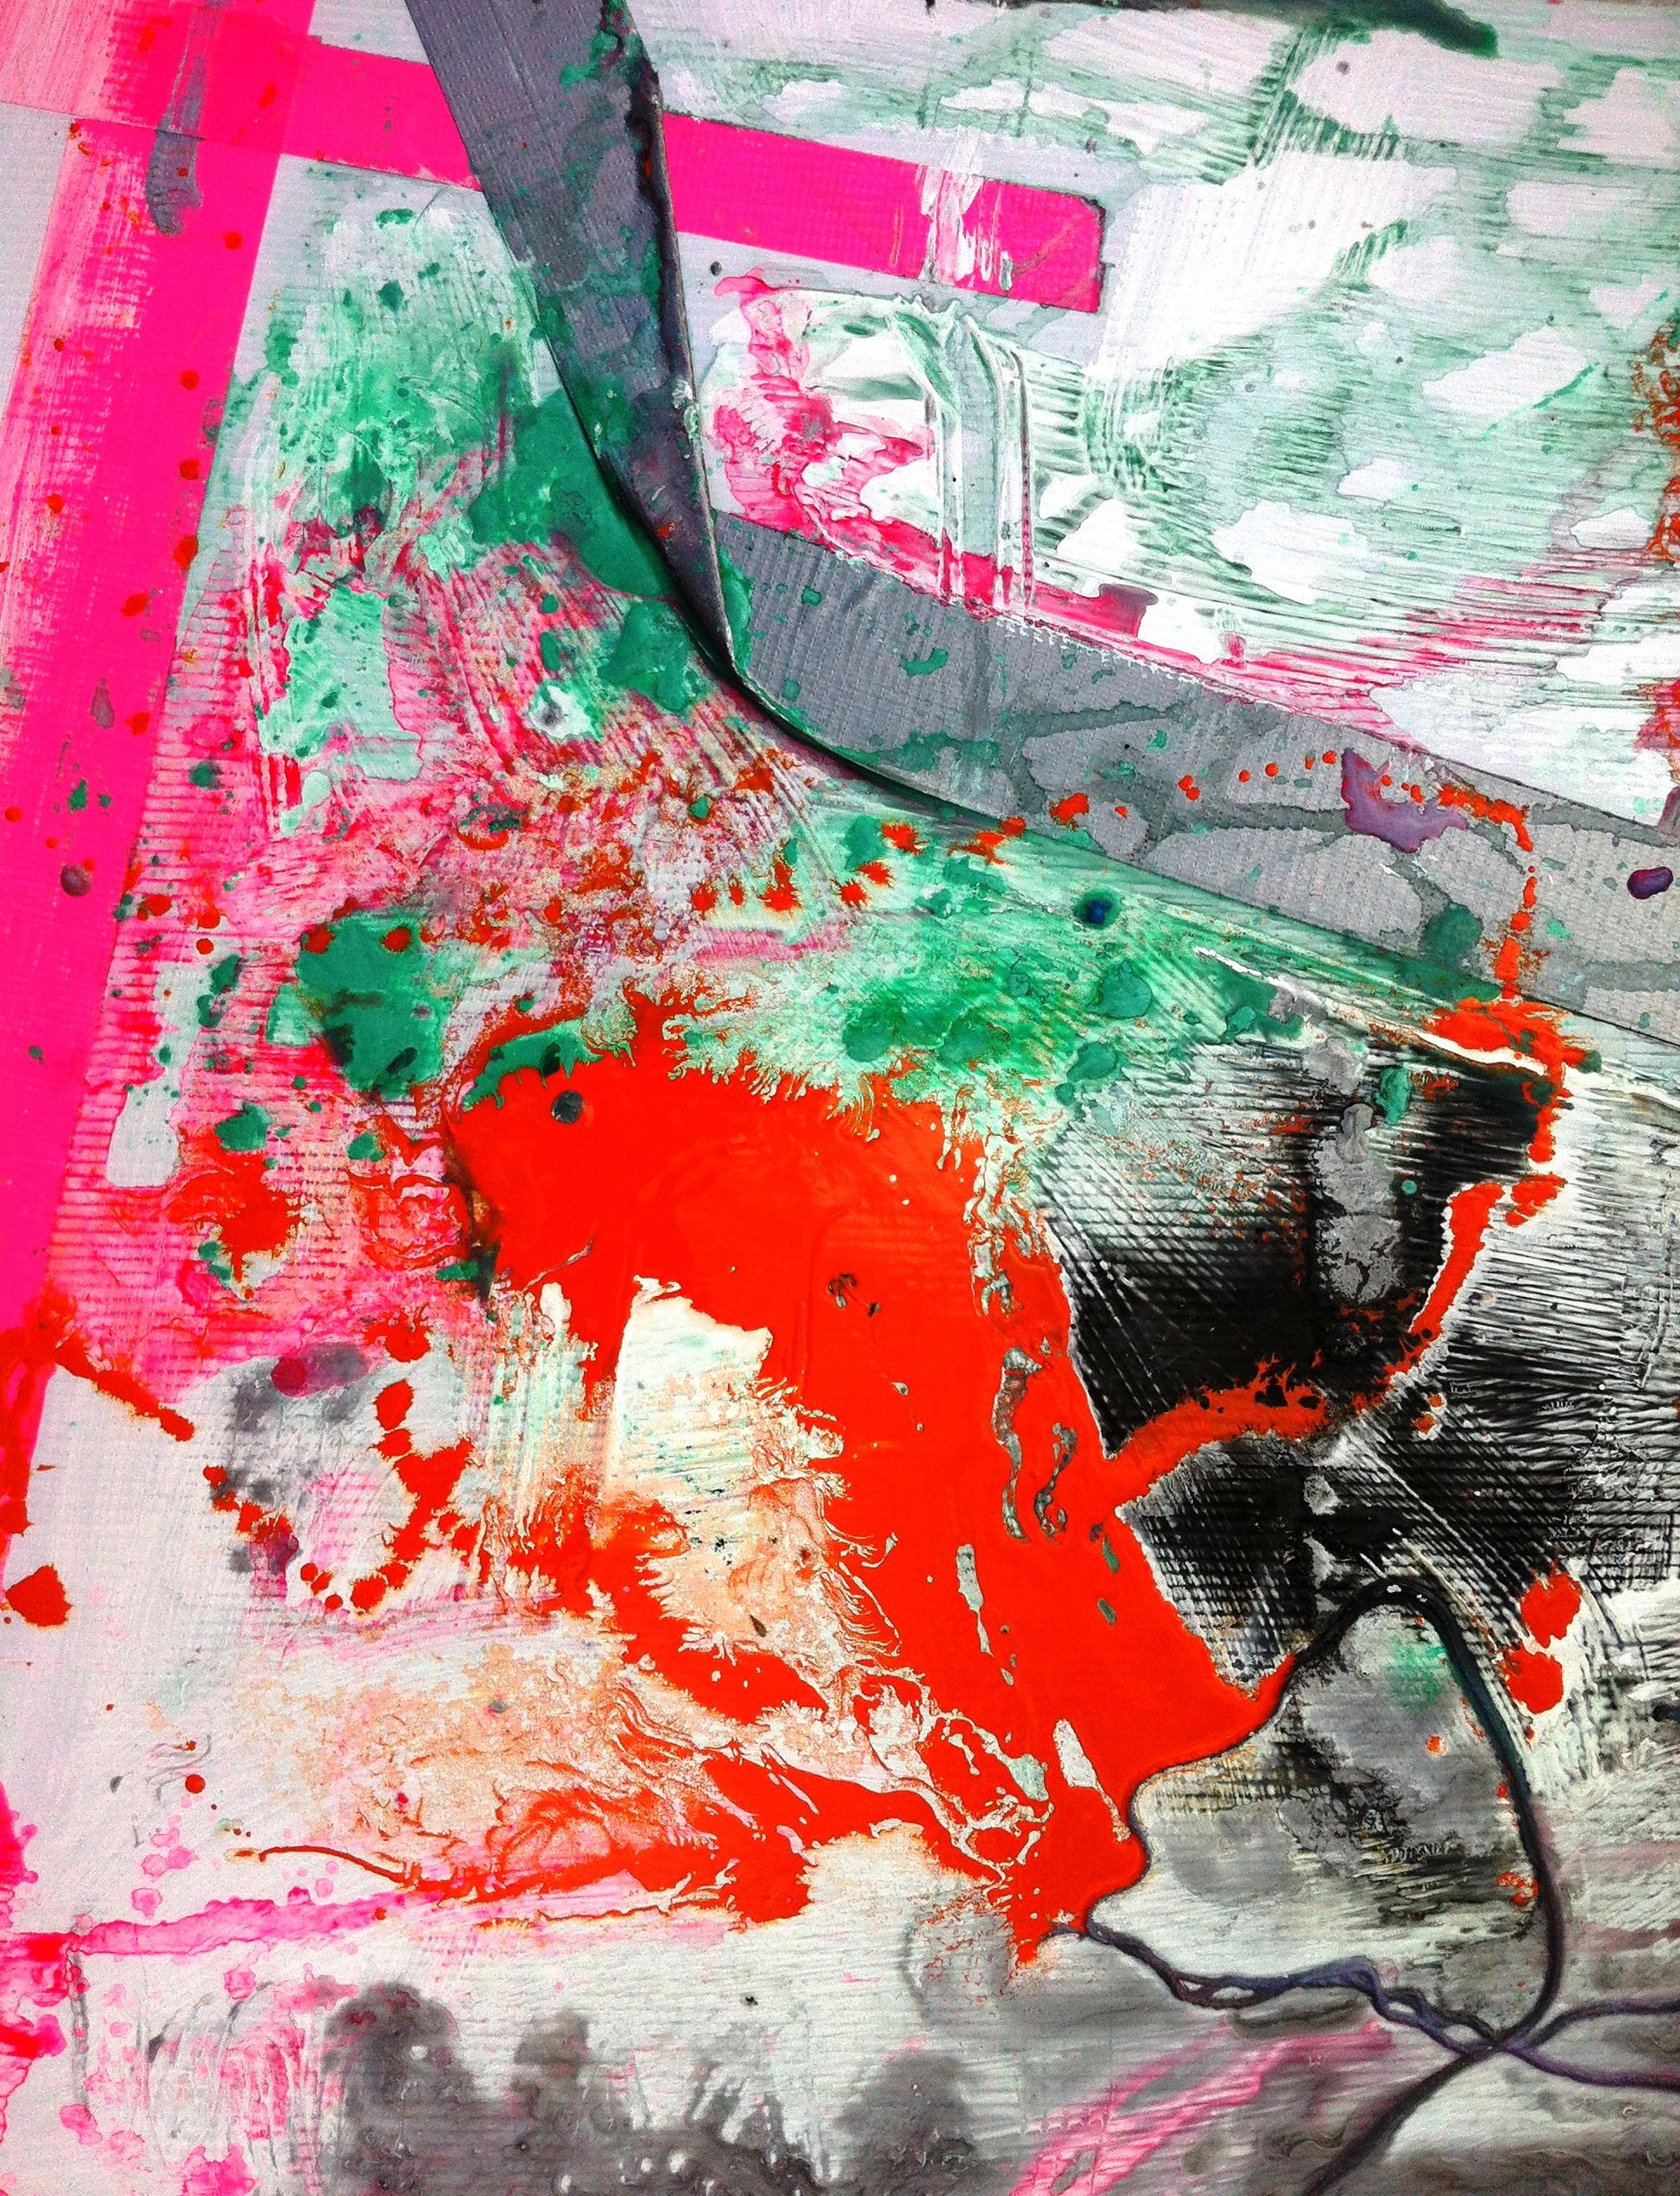 samantha clark art poetry fluoro pink 3